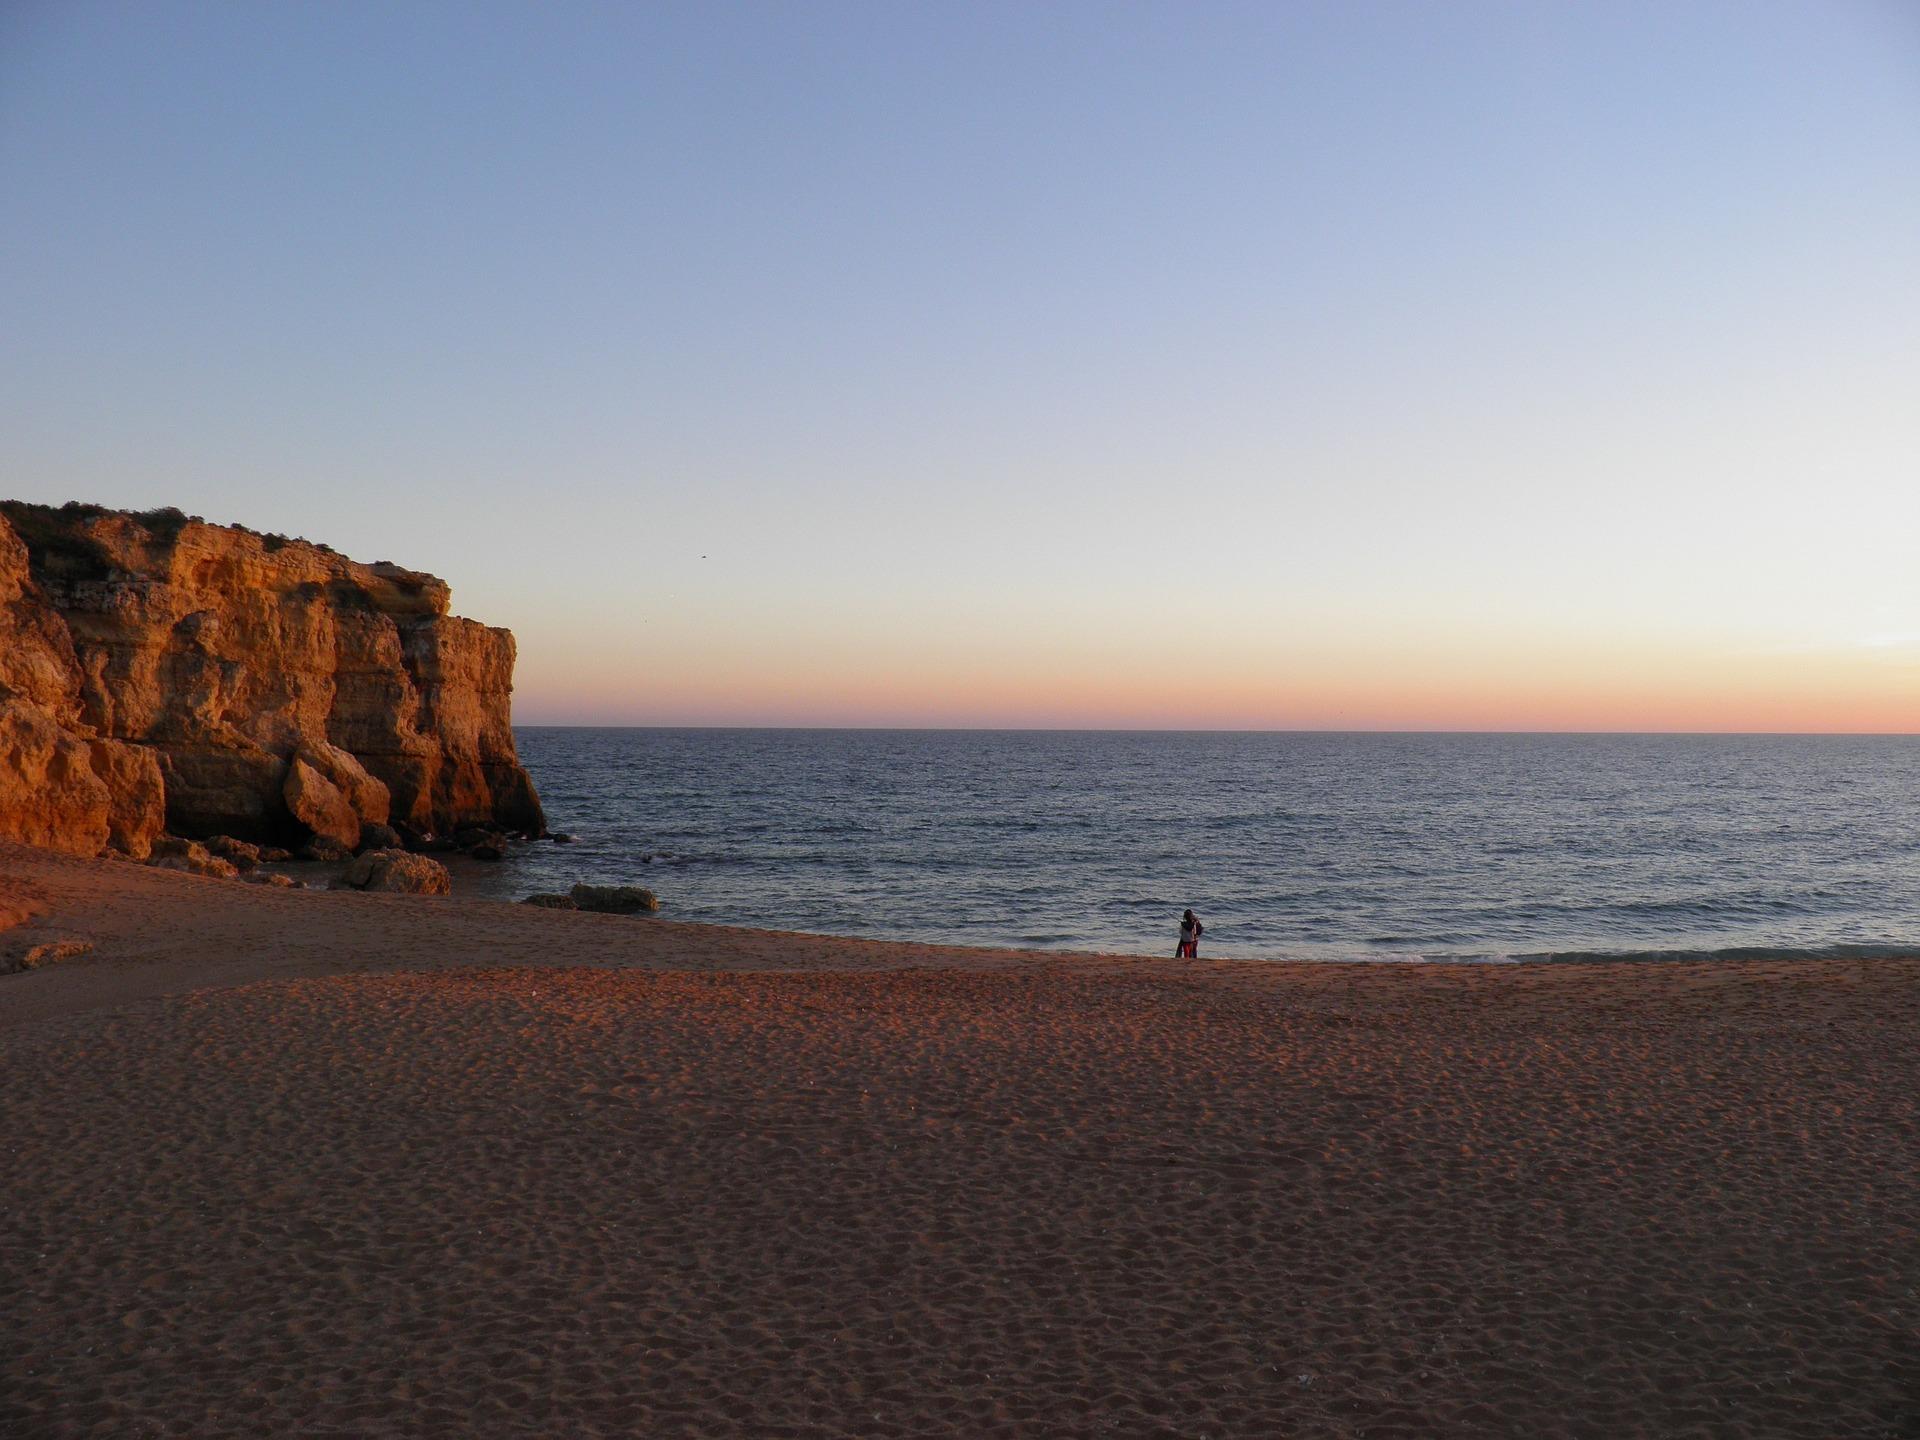 beach in albufeira portugal sea resort